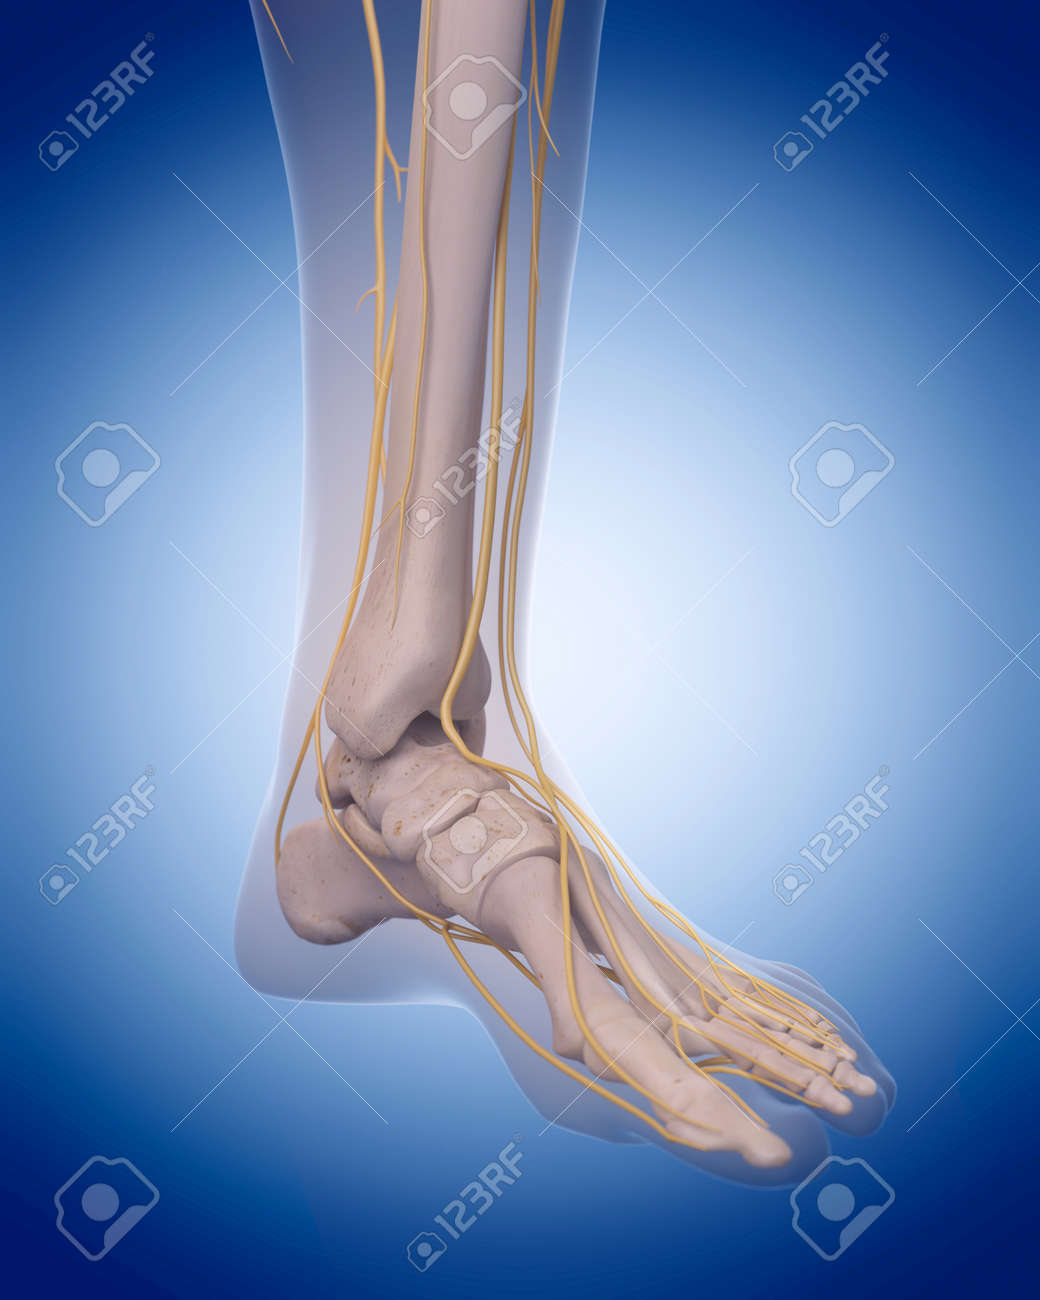 Medizinisch Genaue Illustration - Nerven Des Fußes Lizenzfreie Fotos ...